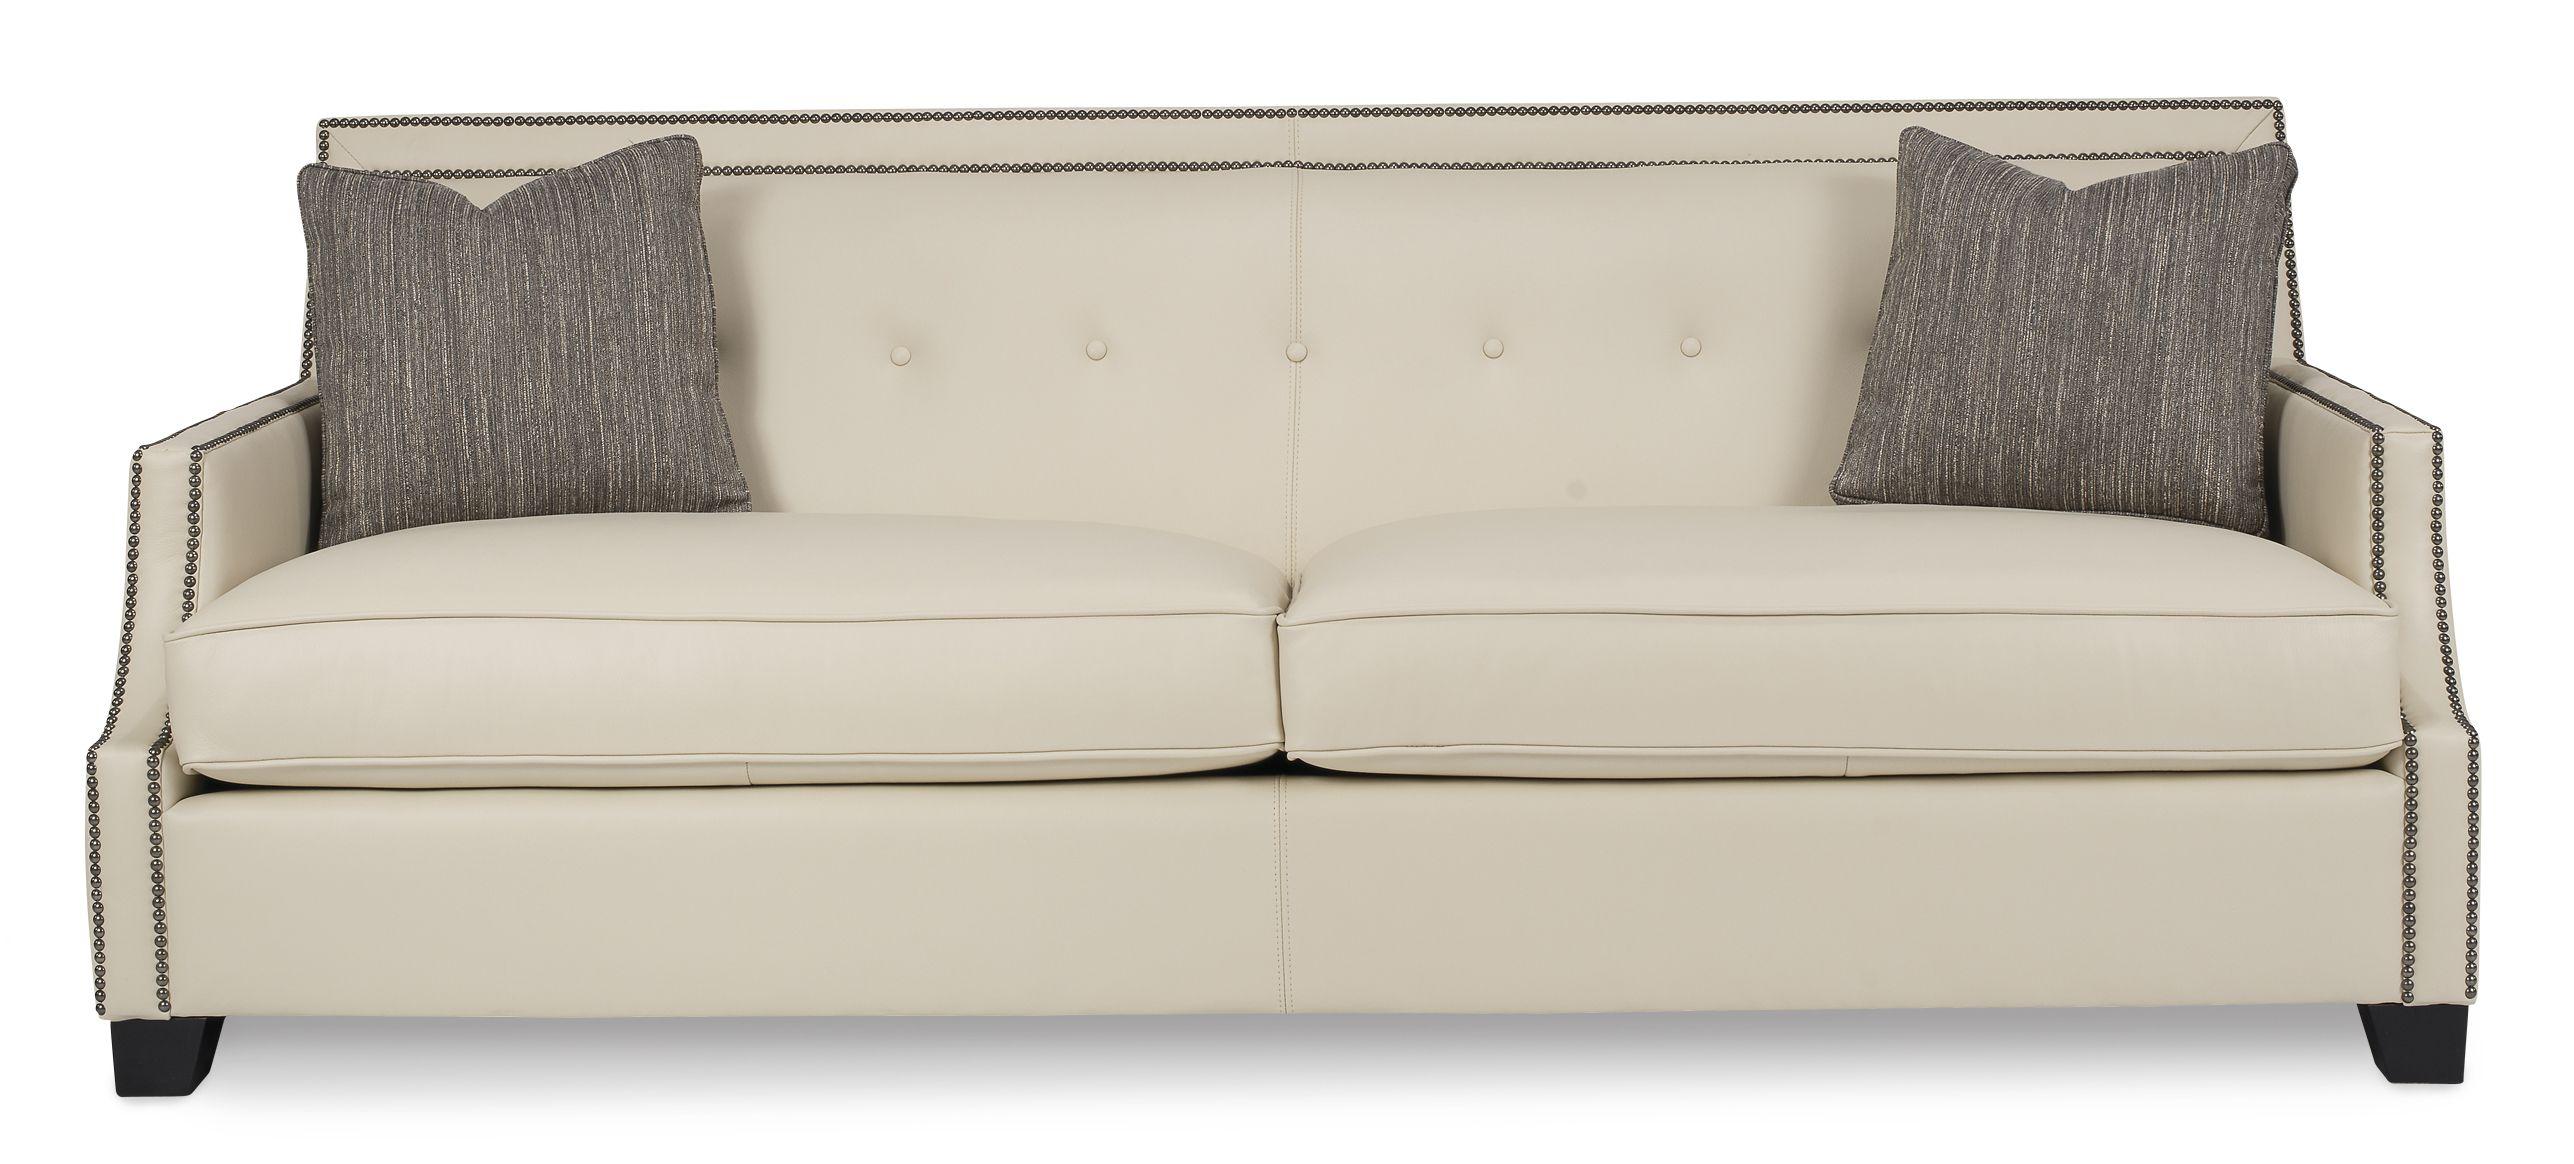 Wondrous Available At Robb Stucky Bernhardt Furniture Download Free Architecture Designs Sospemadebymaigaardcom